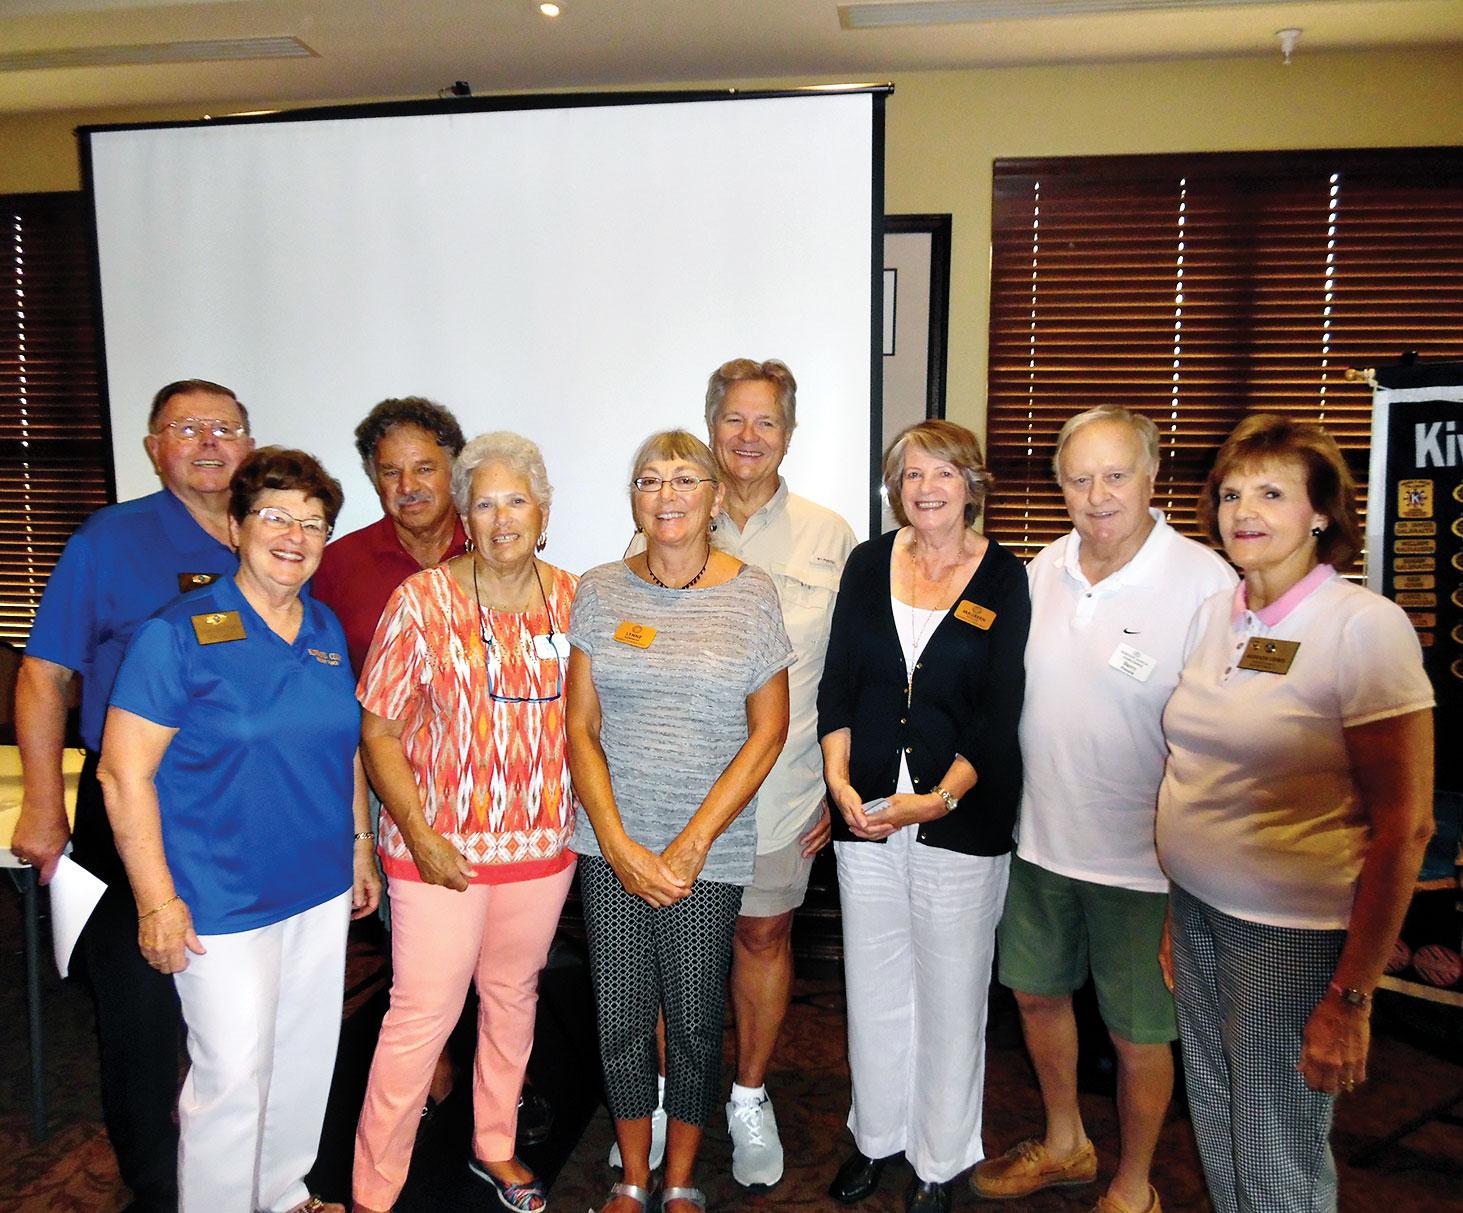 Proud Kiwanians: Galbraiths, Taschners, Barringers, Pococks and President Barbara Leurig